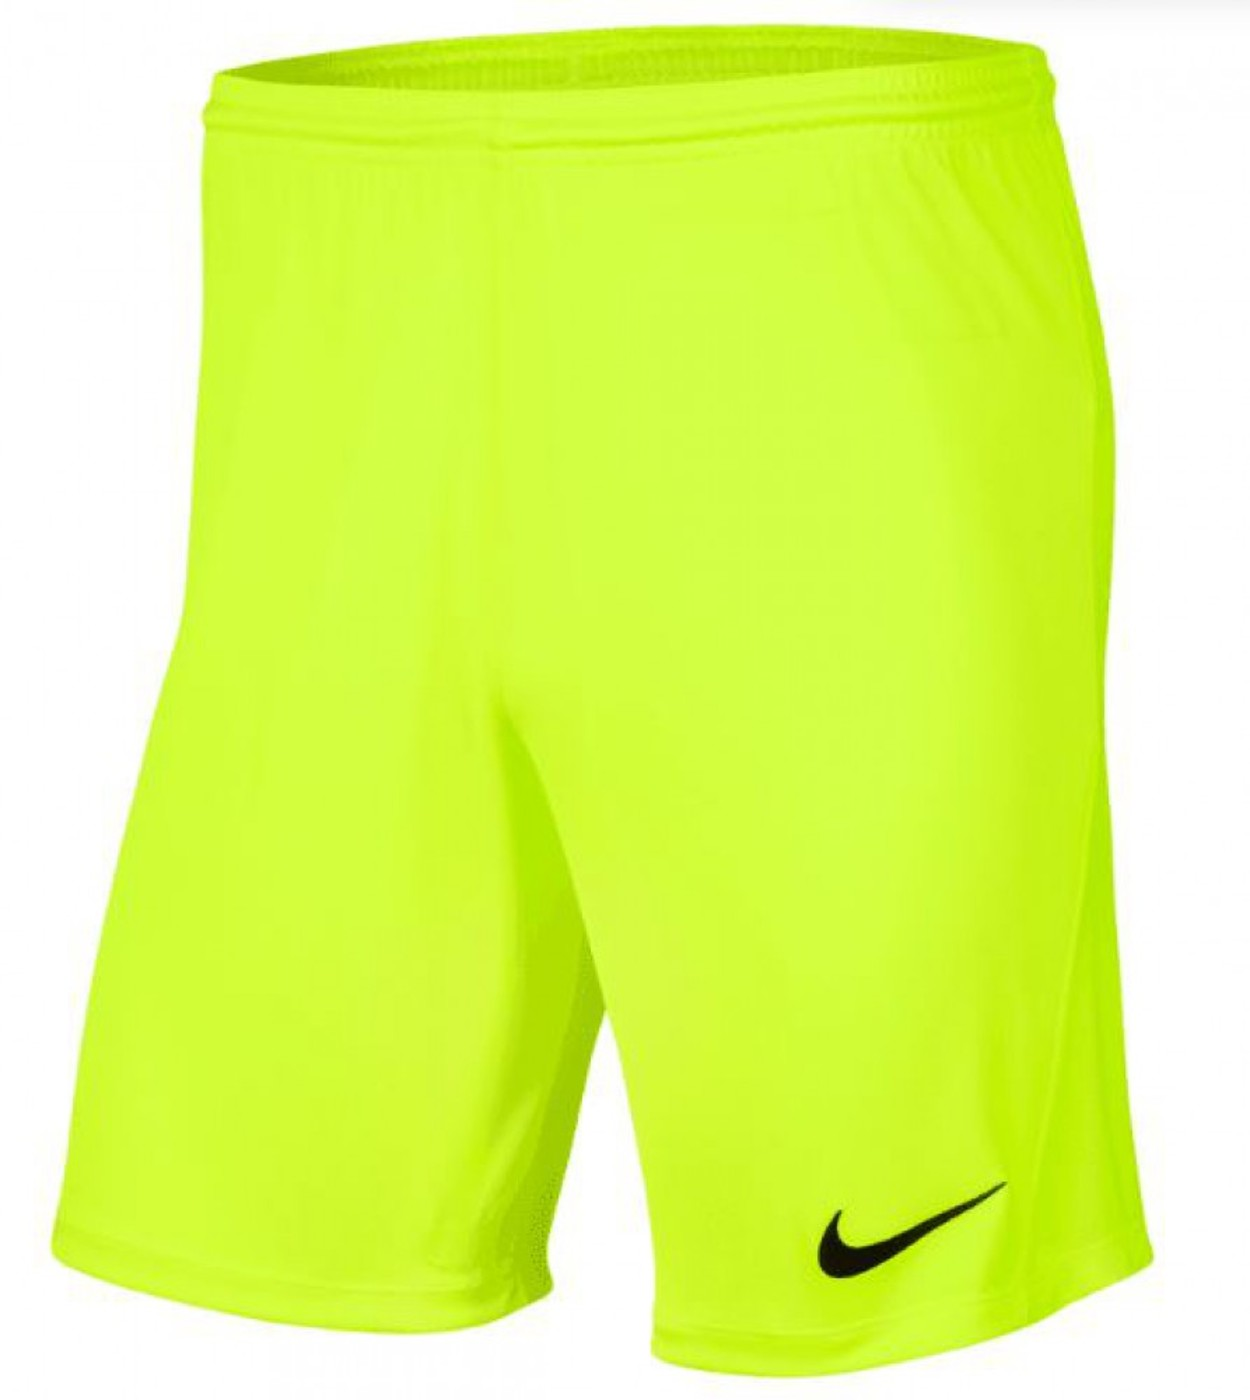 Nike Dri-FIT Park 3 Knit - Herren